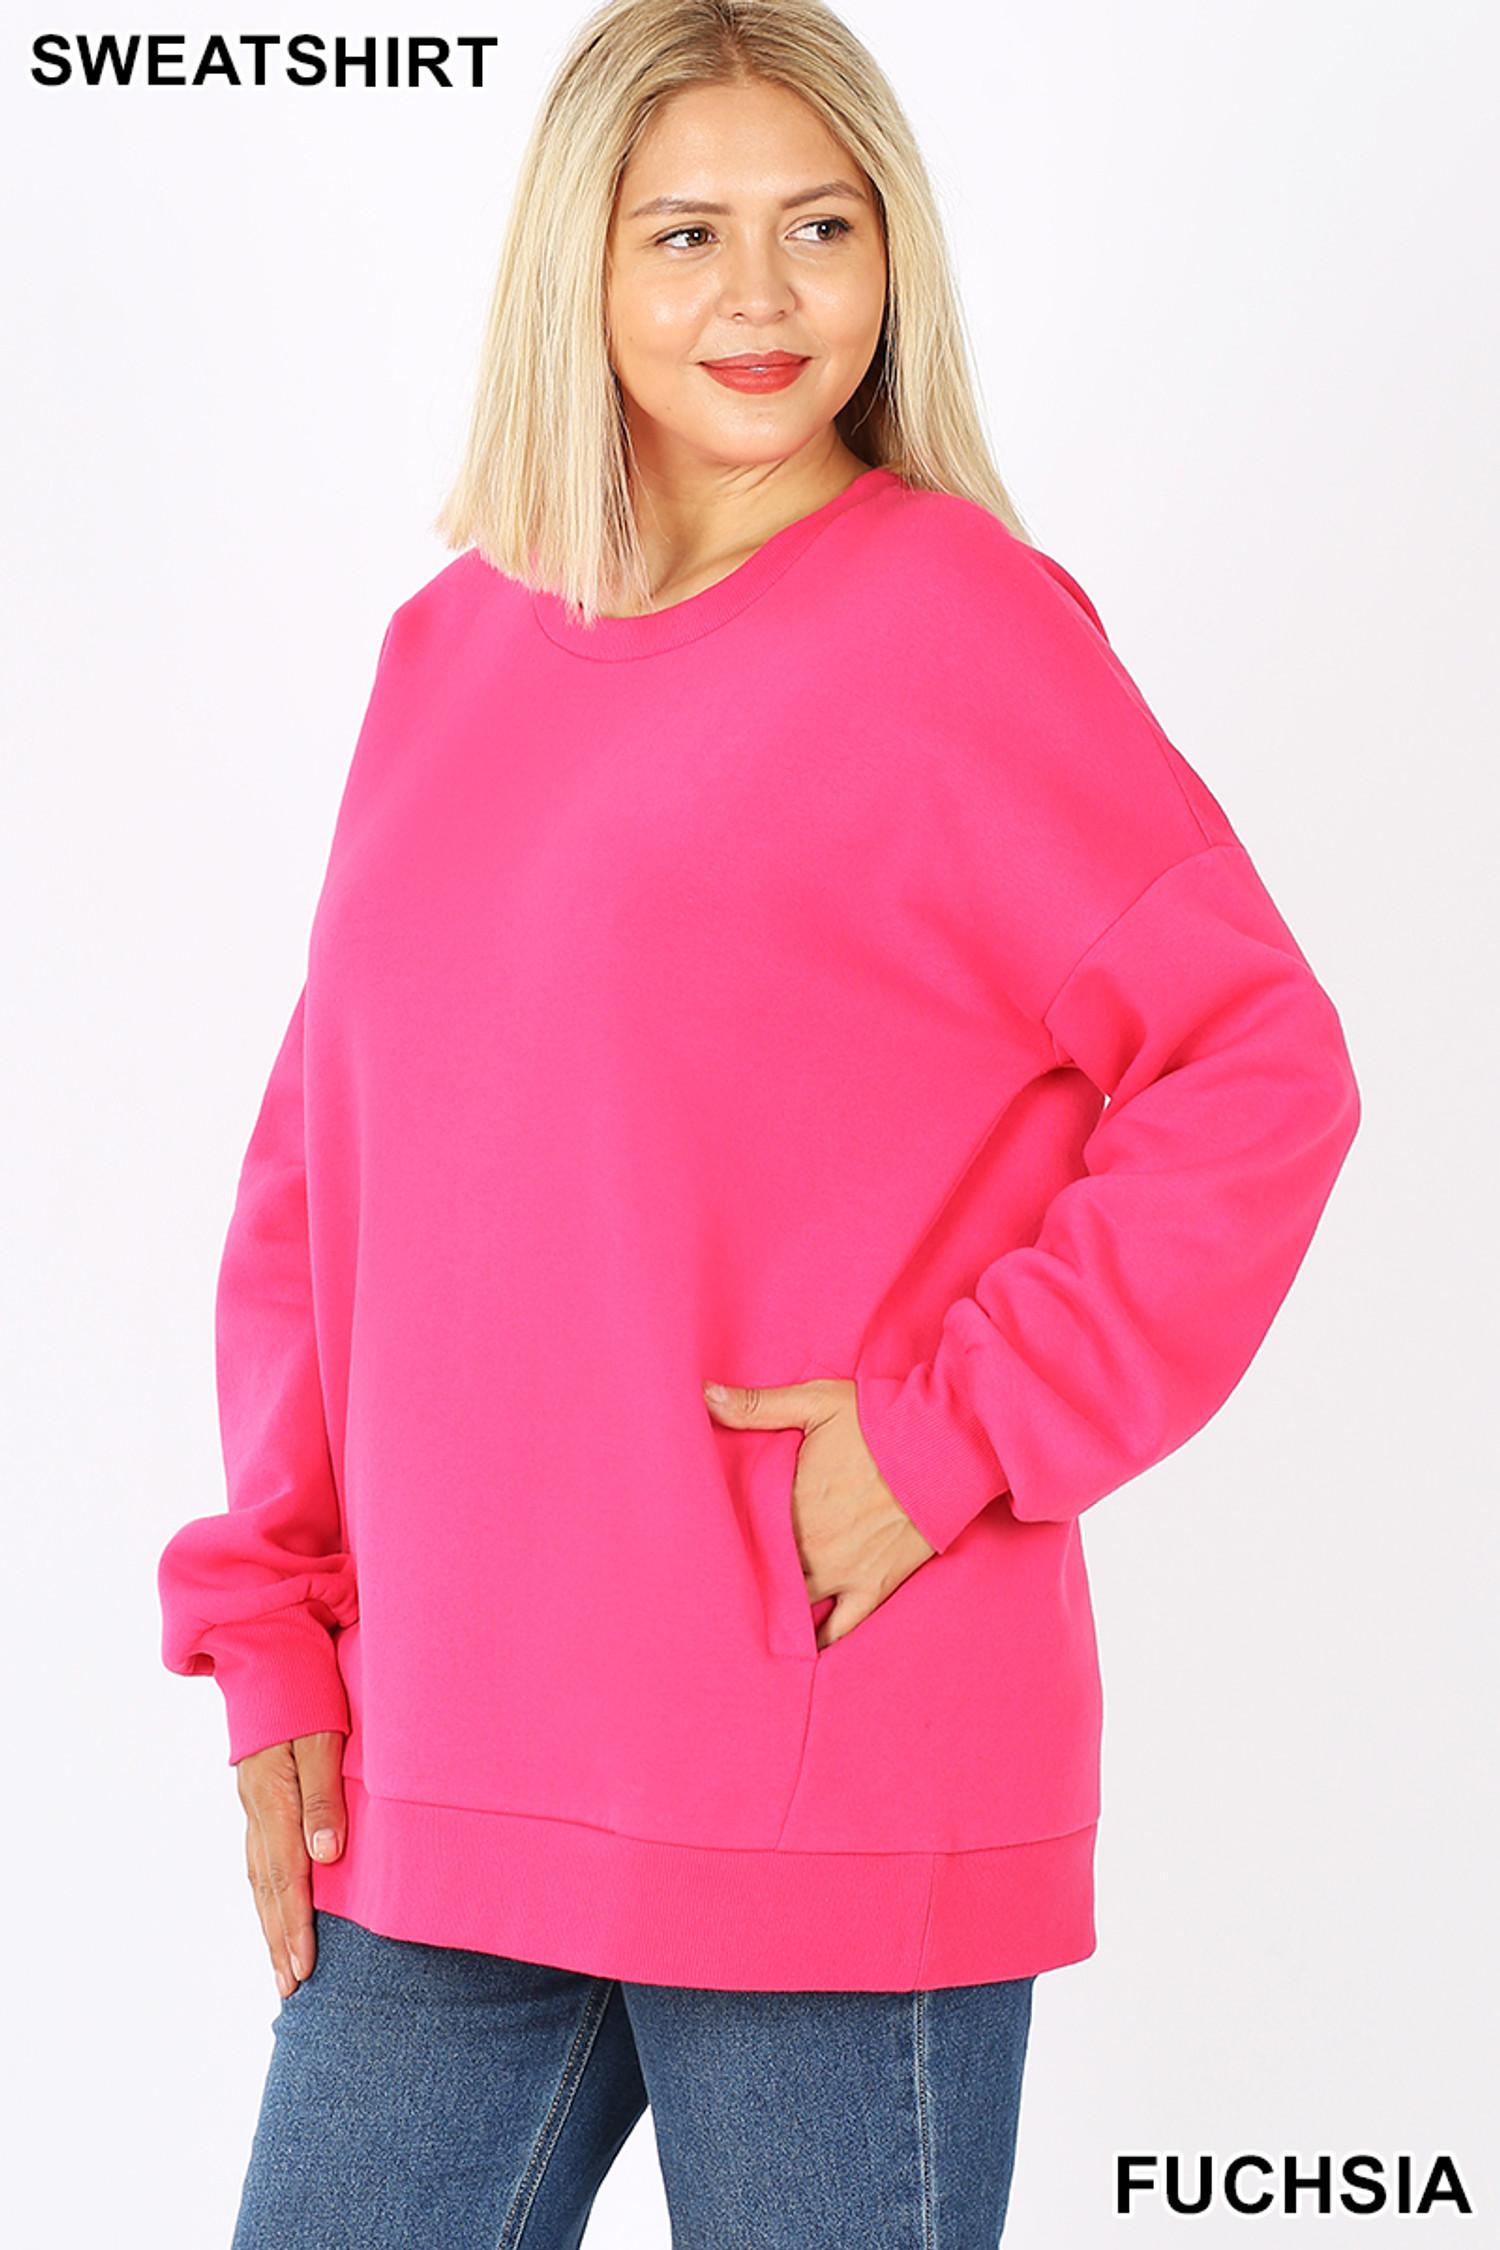 Slightly turned image of Fuchsia Cotton Round Crew Neck Plus Size Sweatshirt with Side Pockets